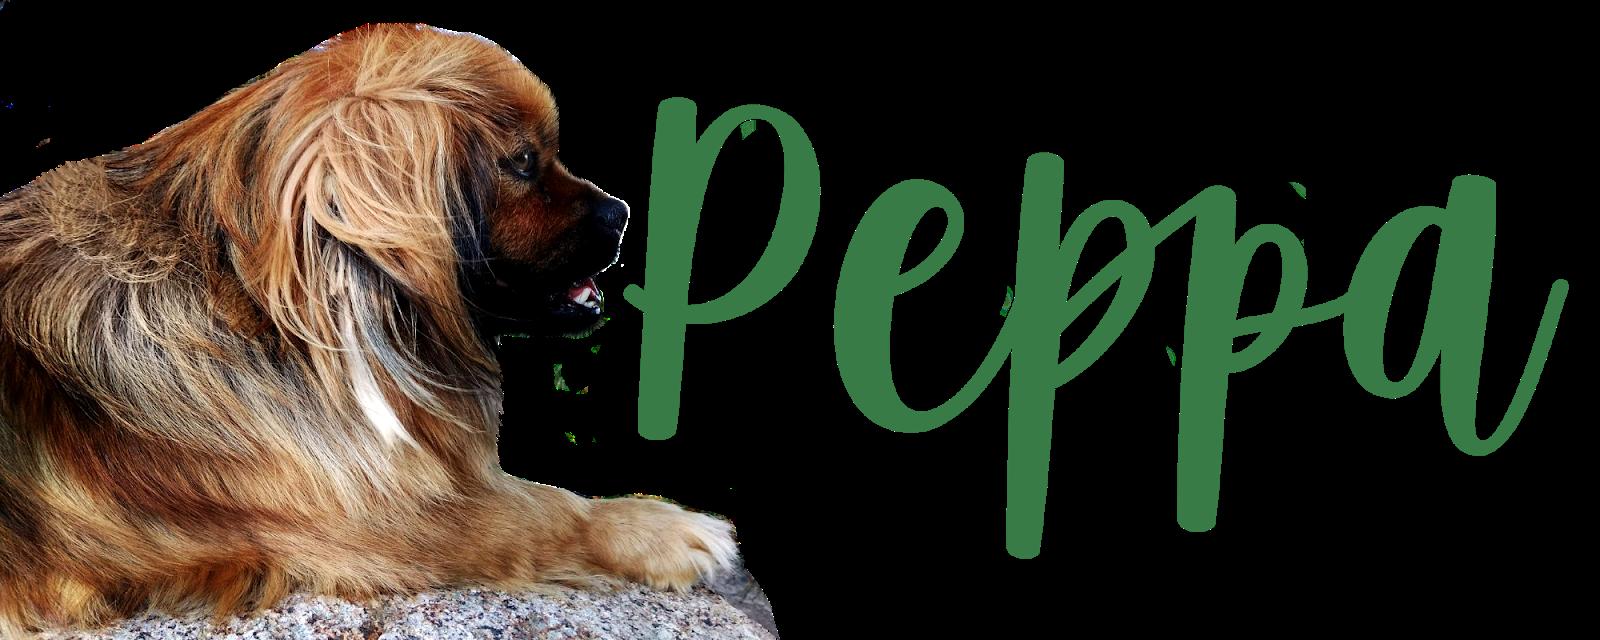 Peppa - mój kochany kundelek